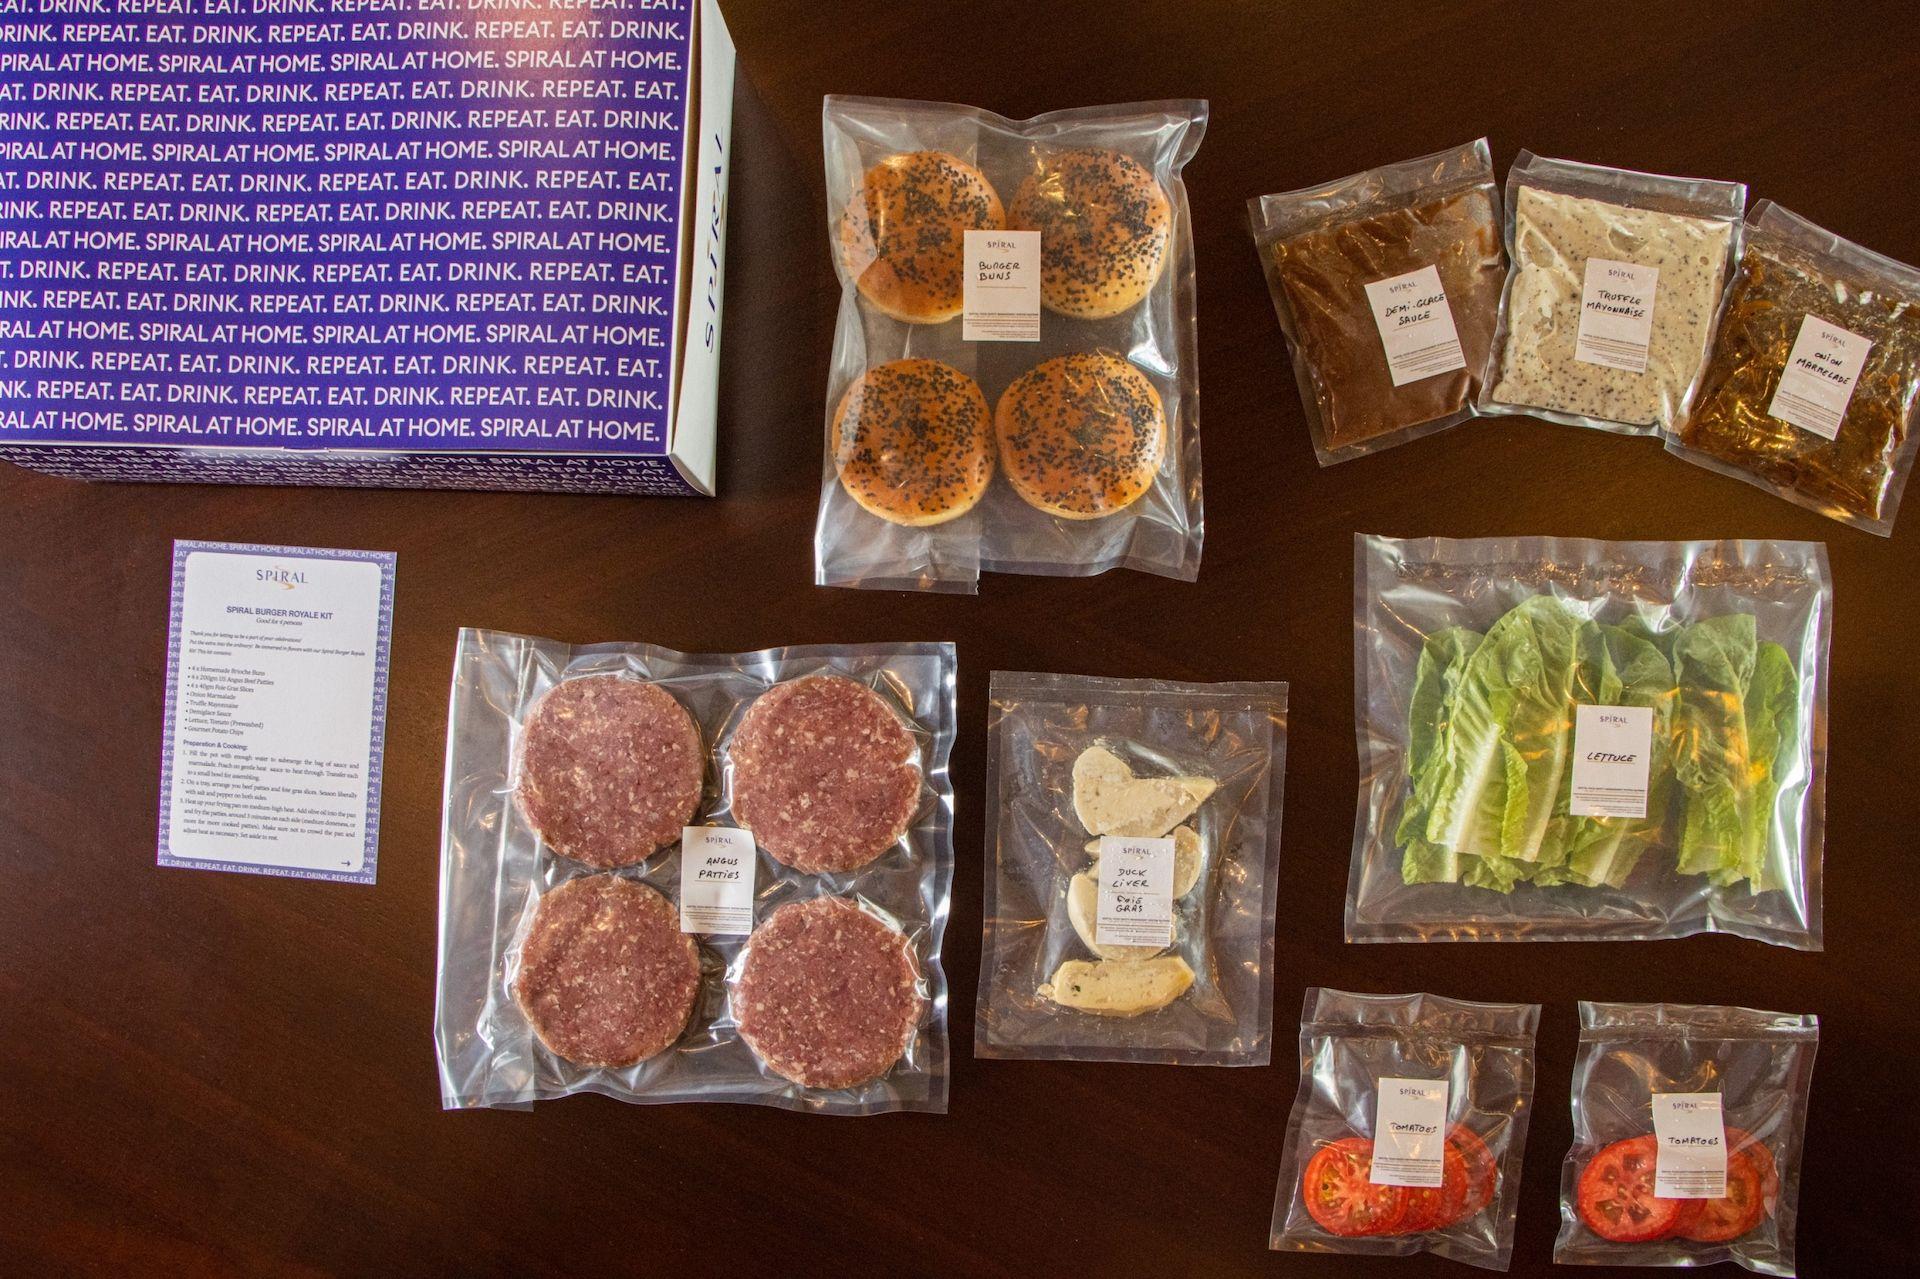 DIY burger kit